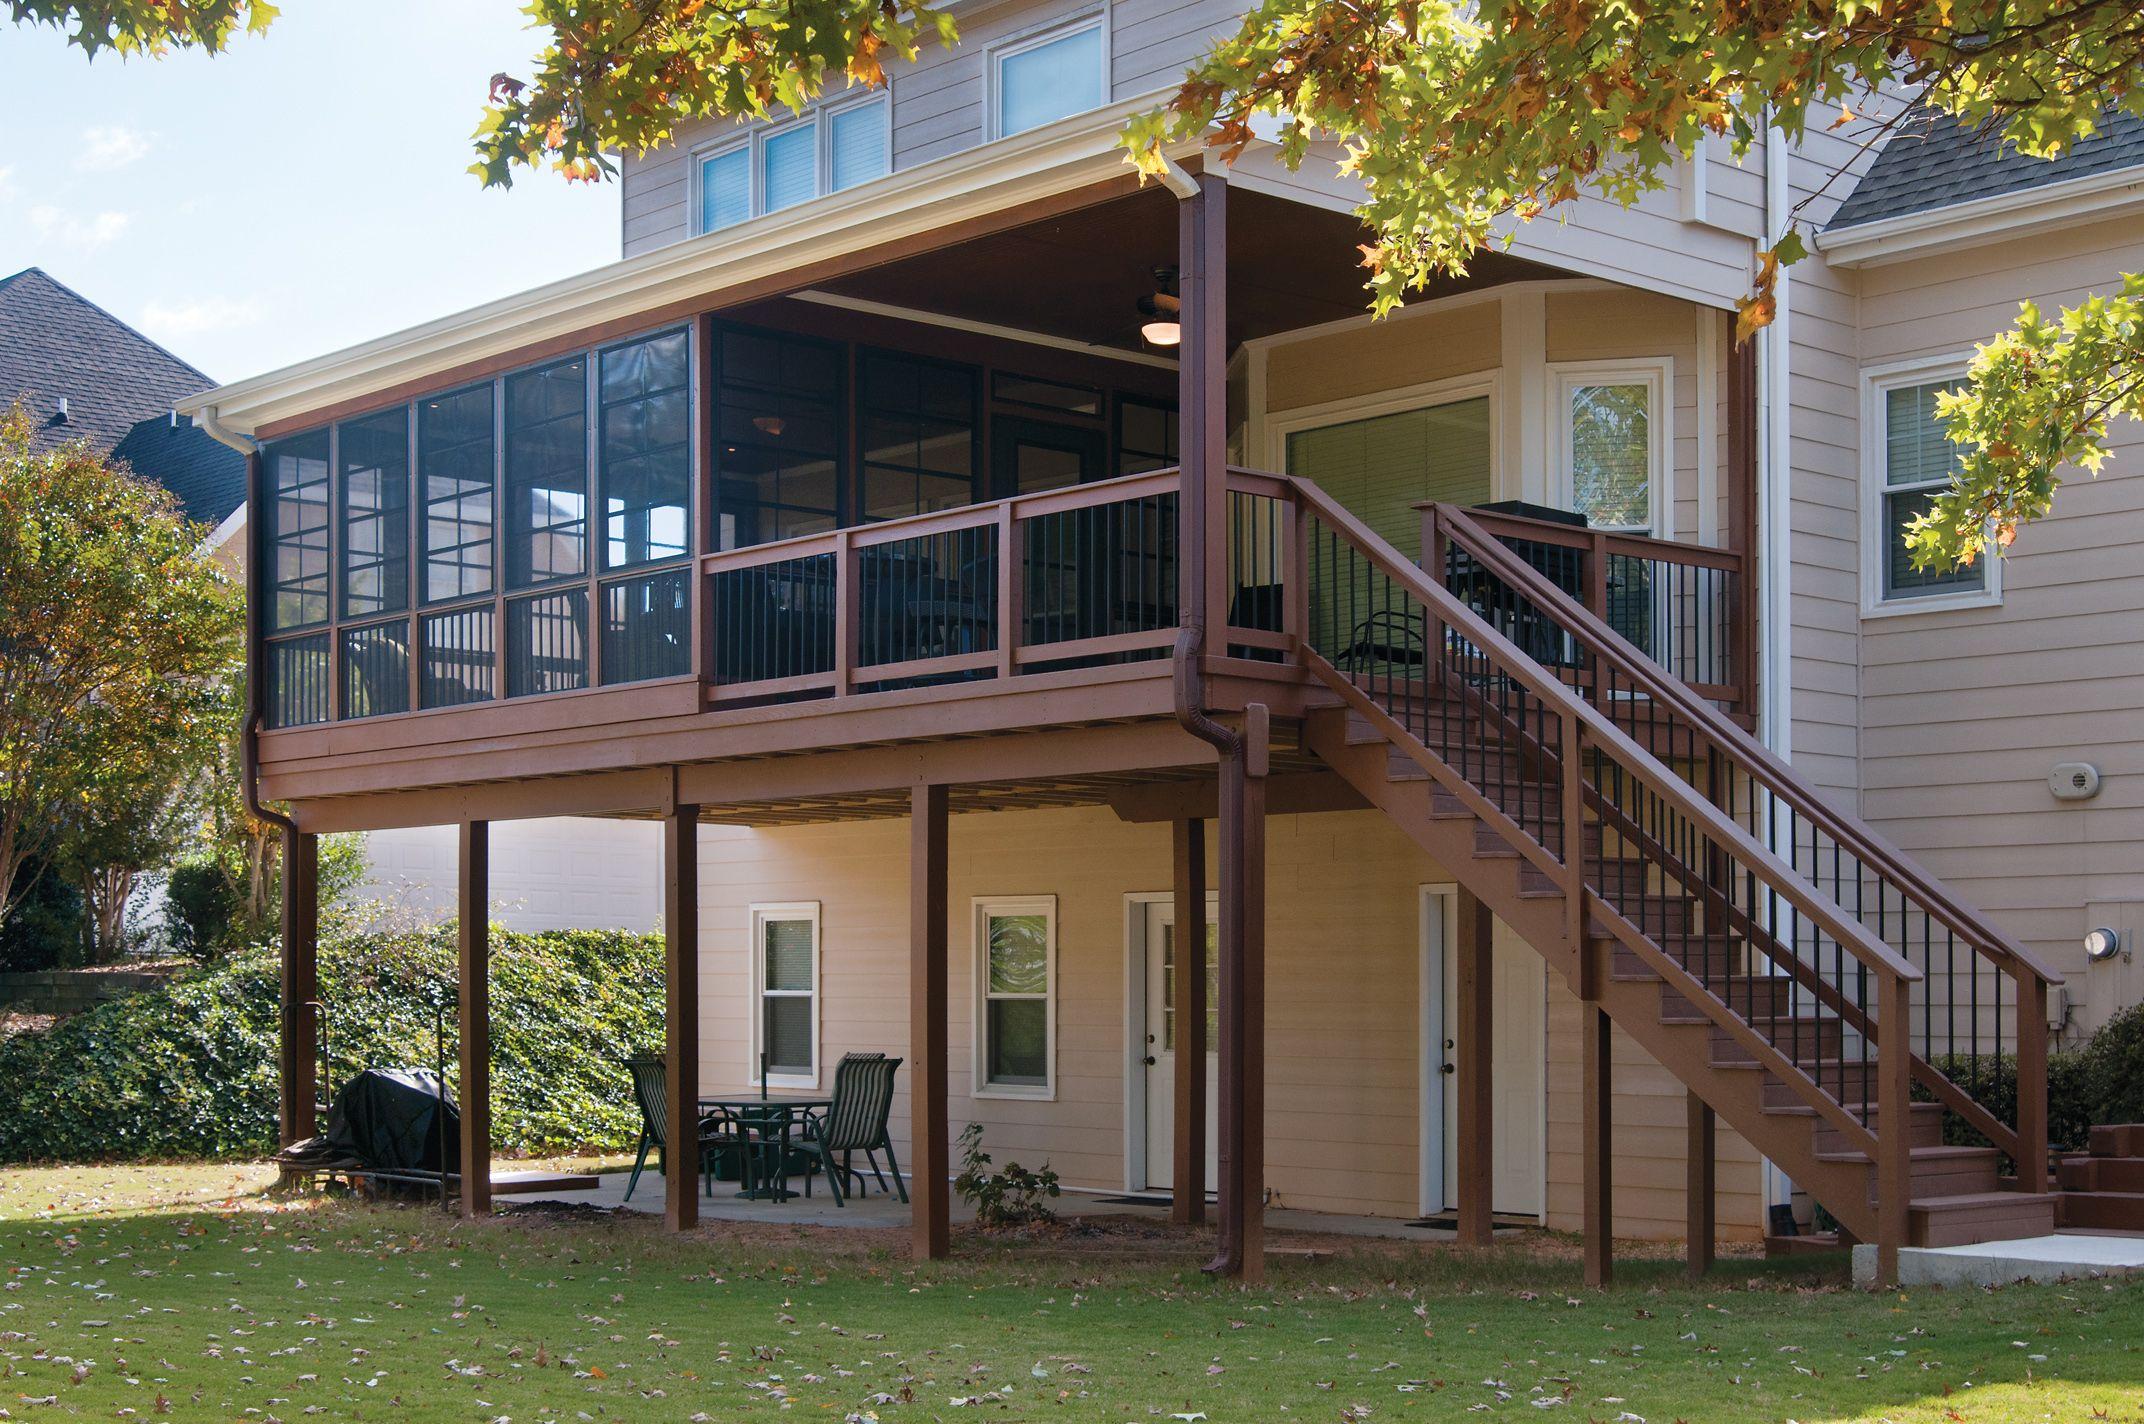 Exterior Photo Of Three Season Porch With Eze Breeze